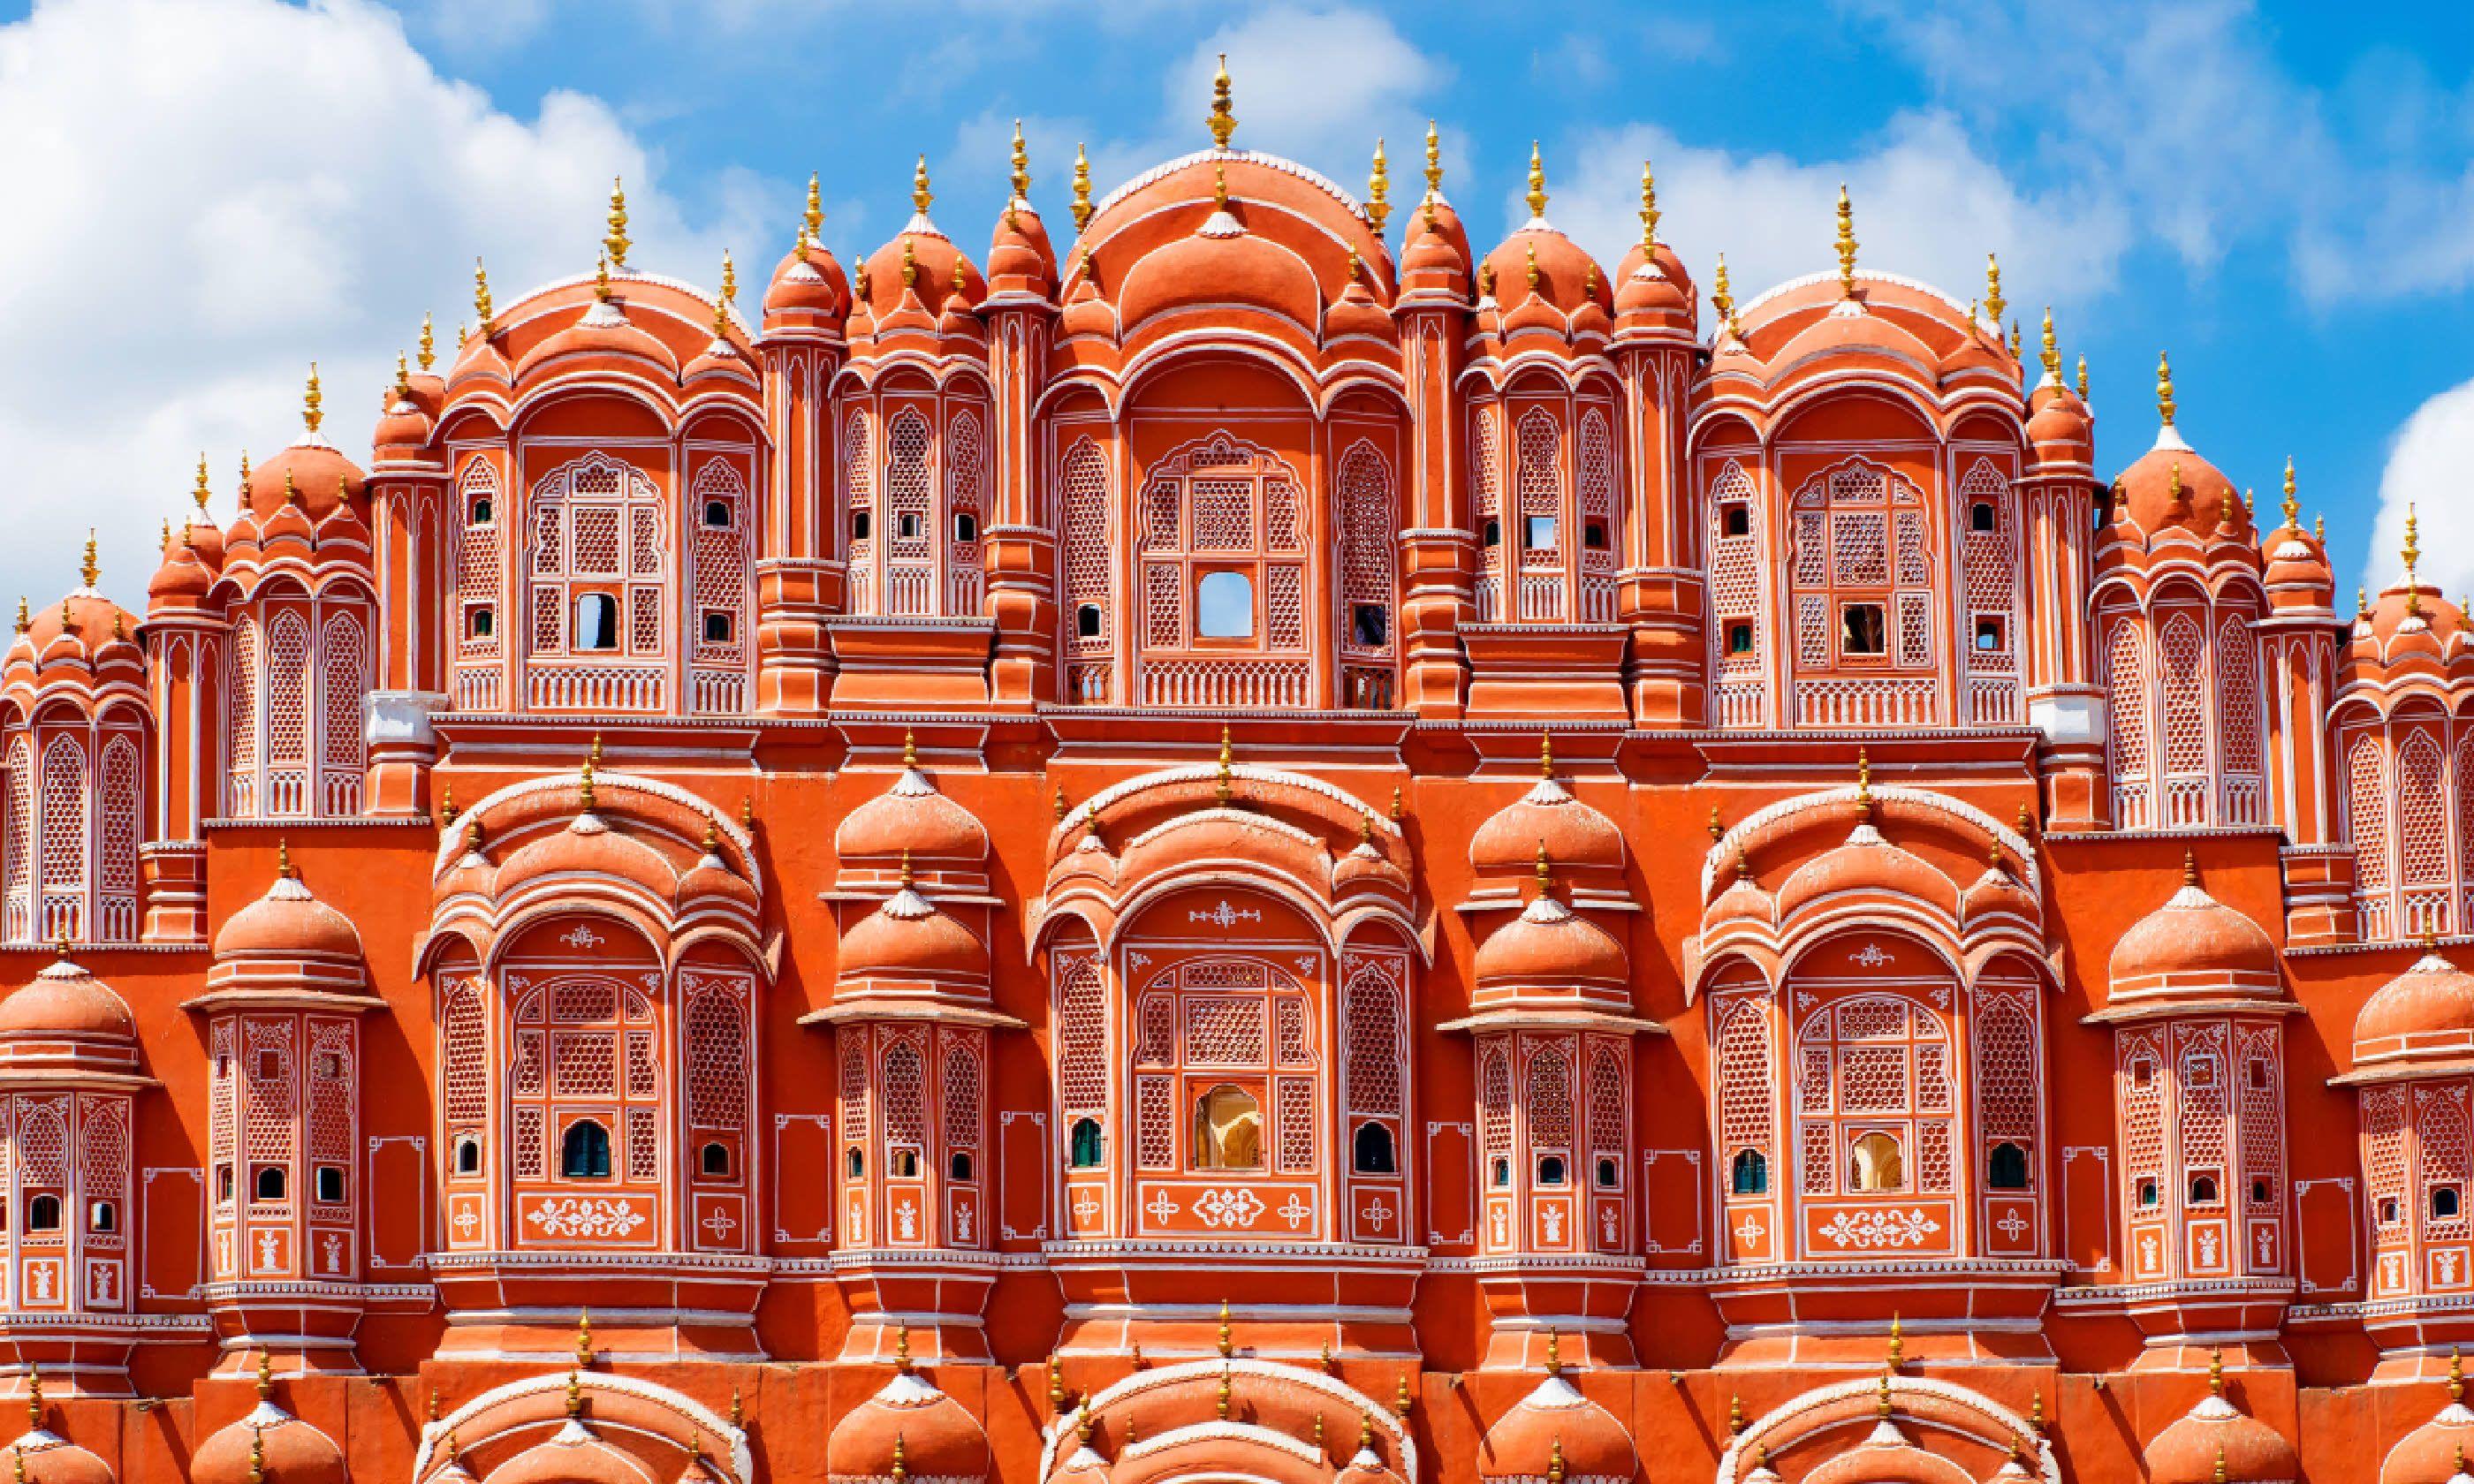 Jaipur, Rajasthan (Shutterstock)